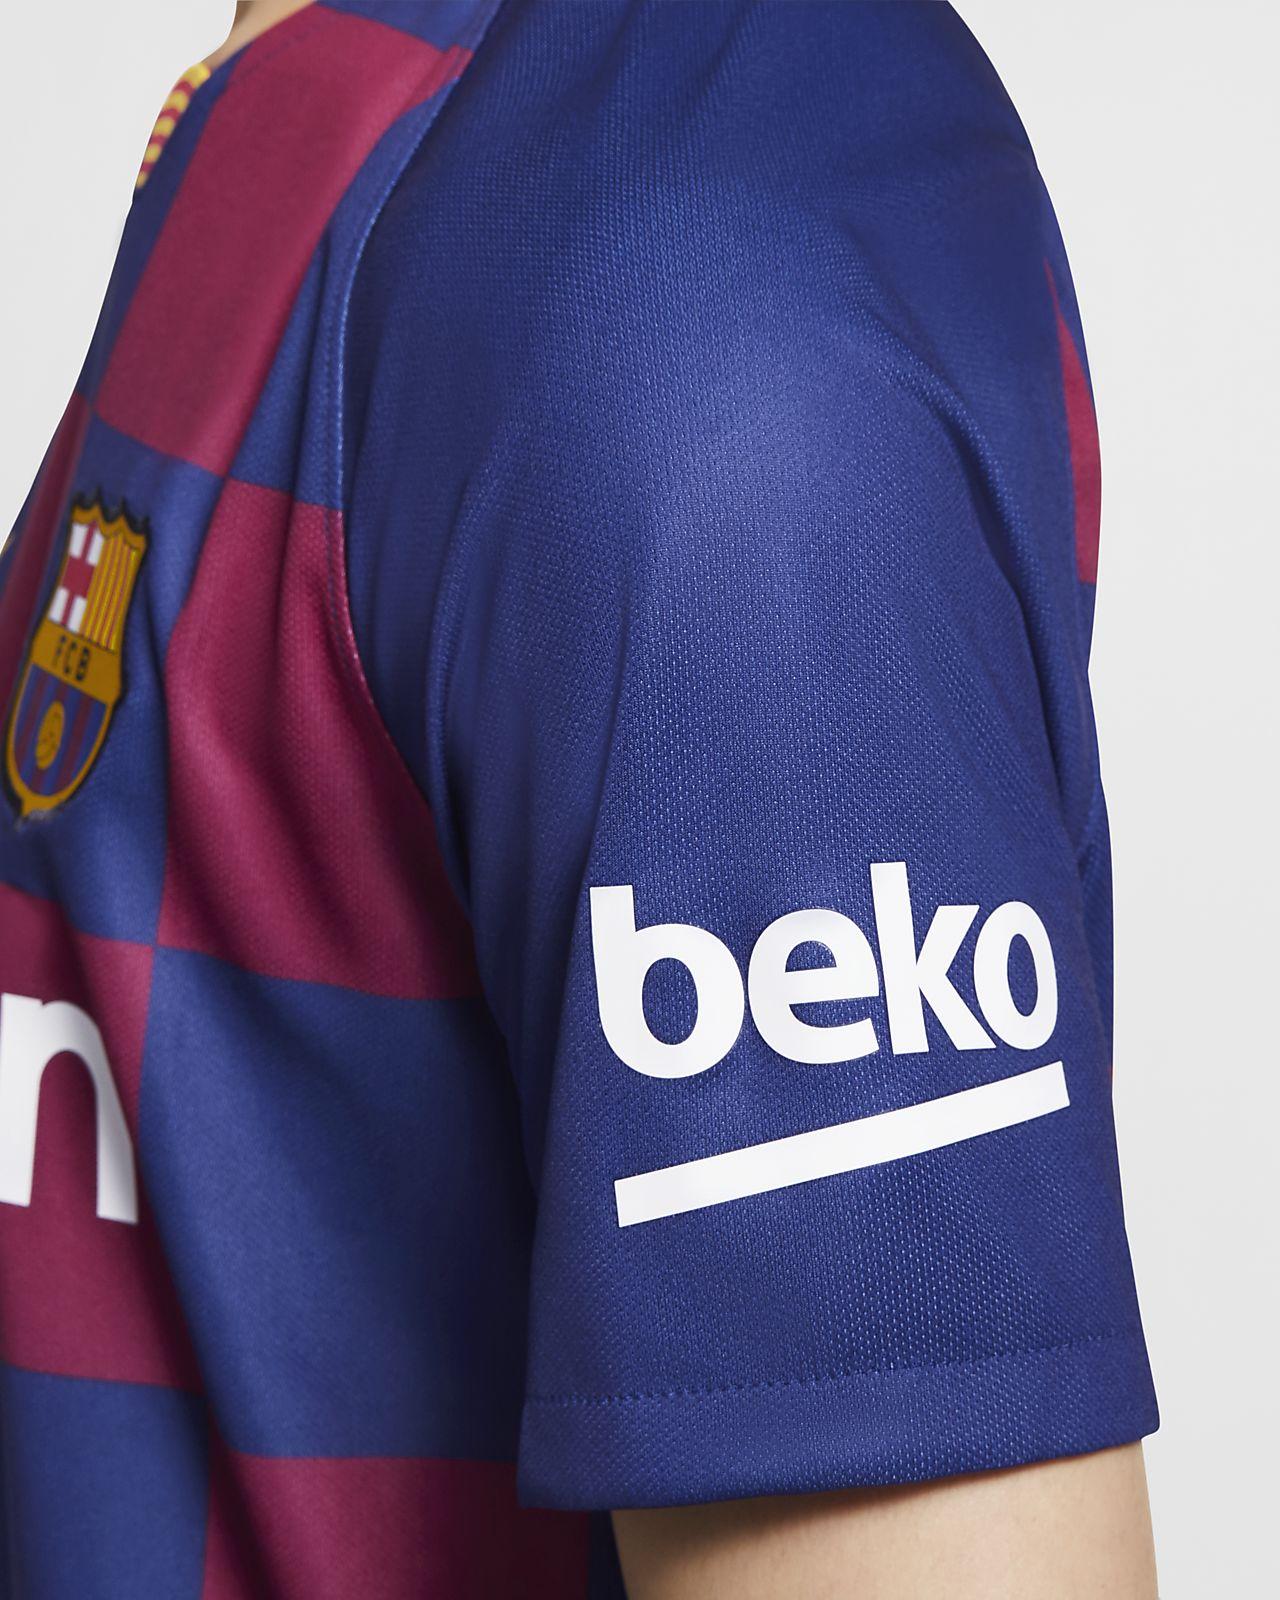 reputable site 348d3 2e8b2 FC Barcelona 2019/20 Stadium Home Soccer Jersey